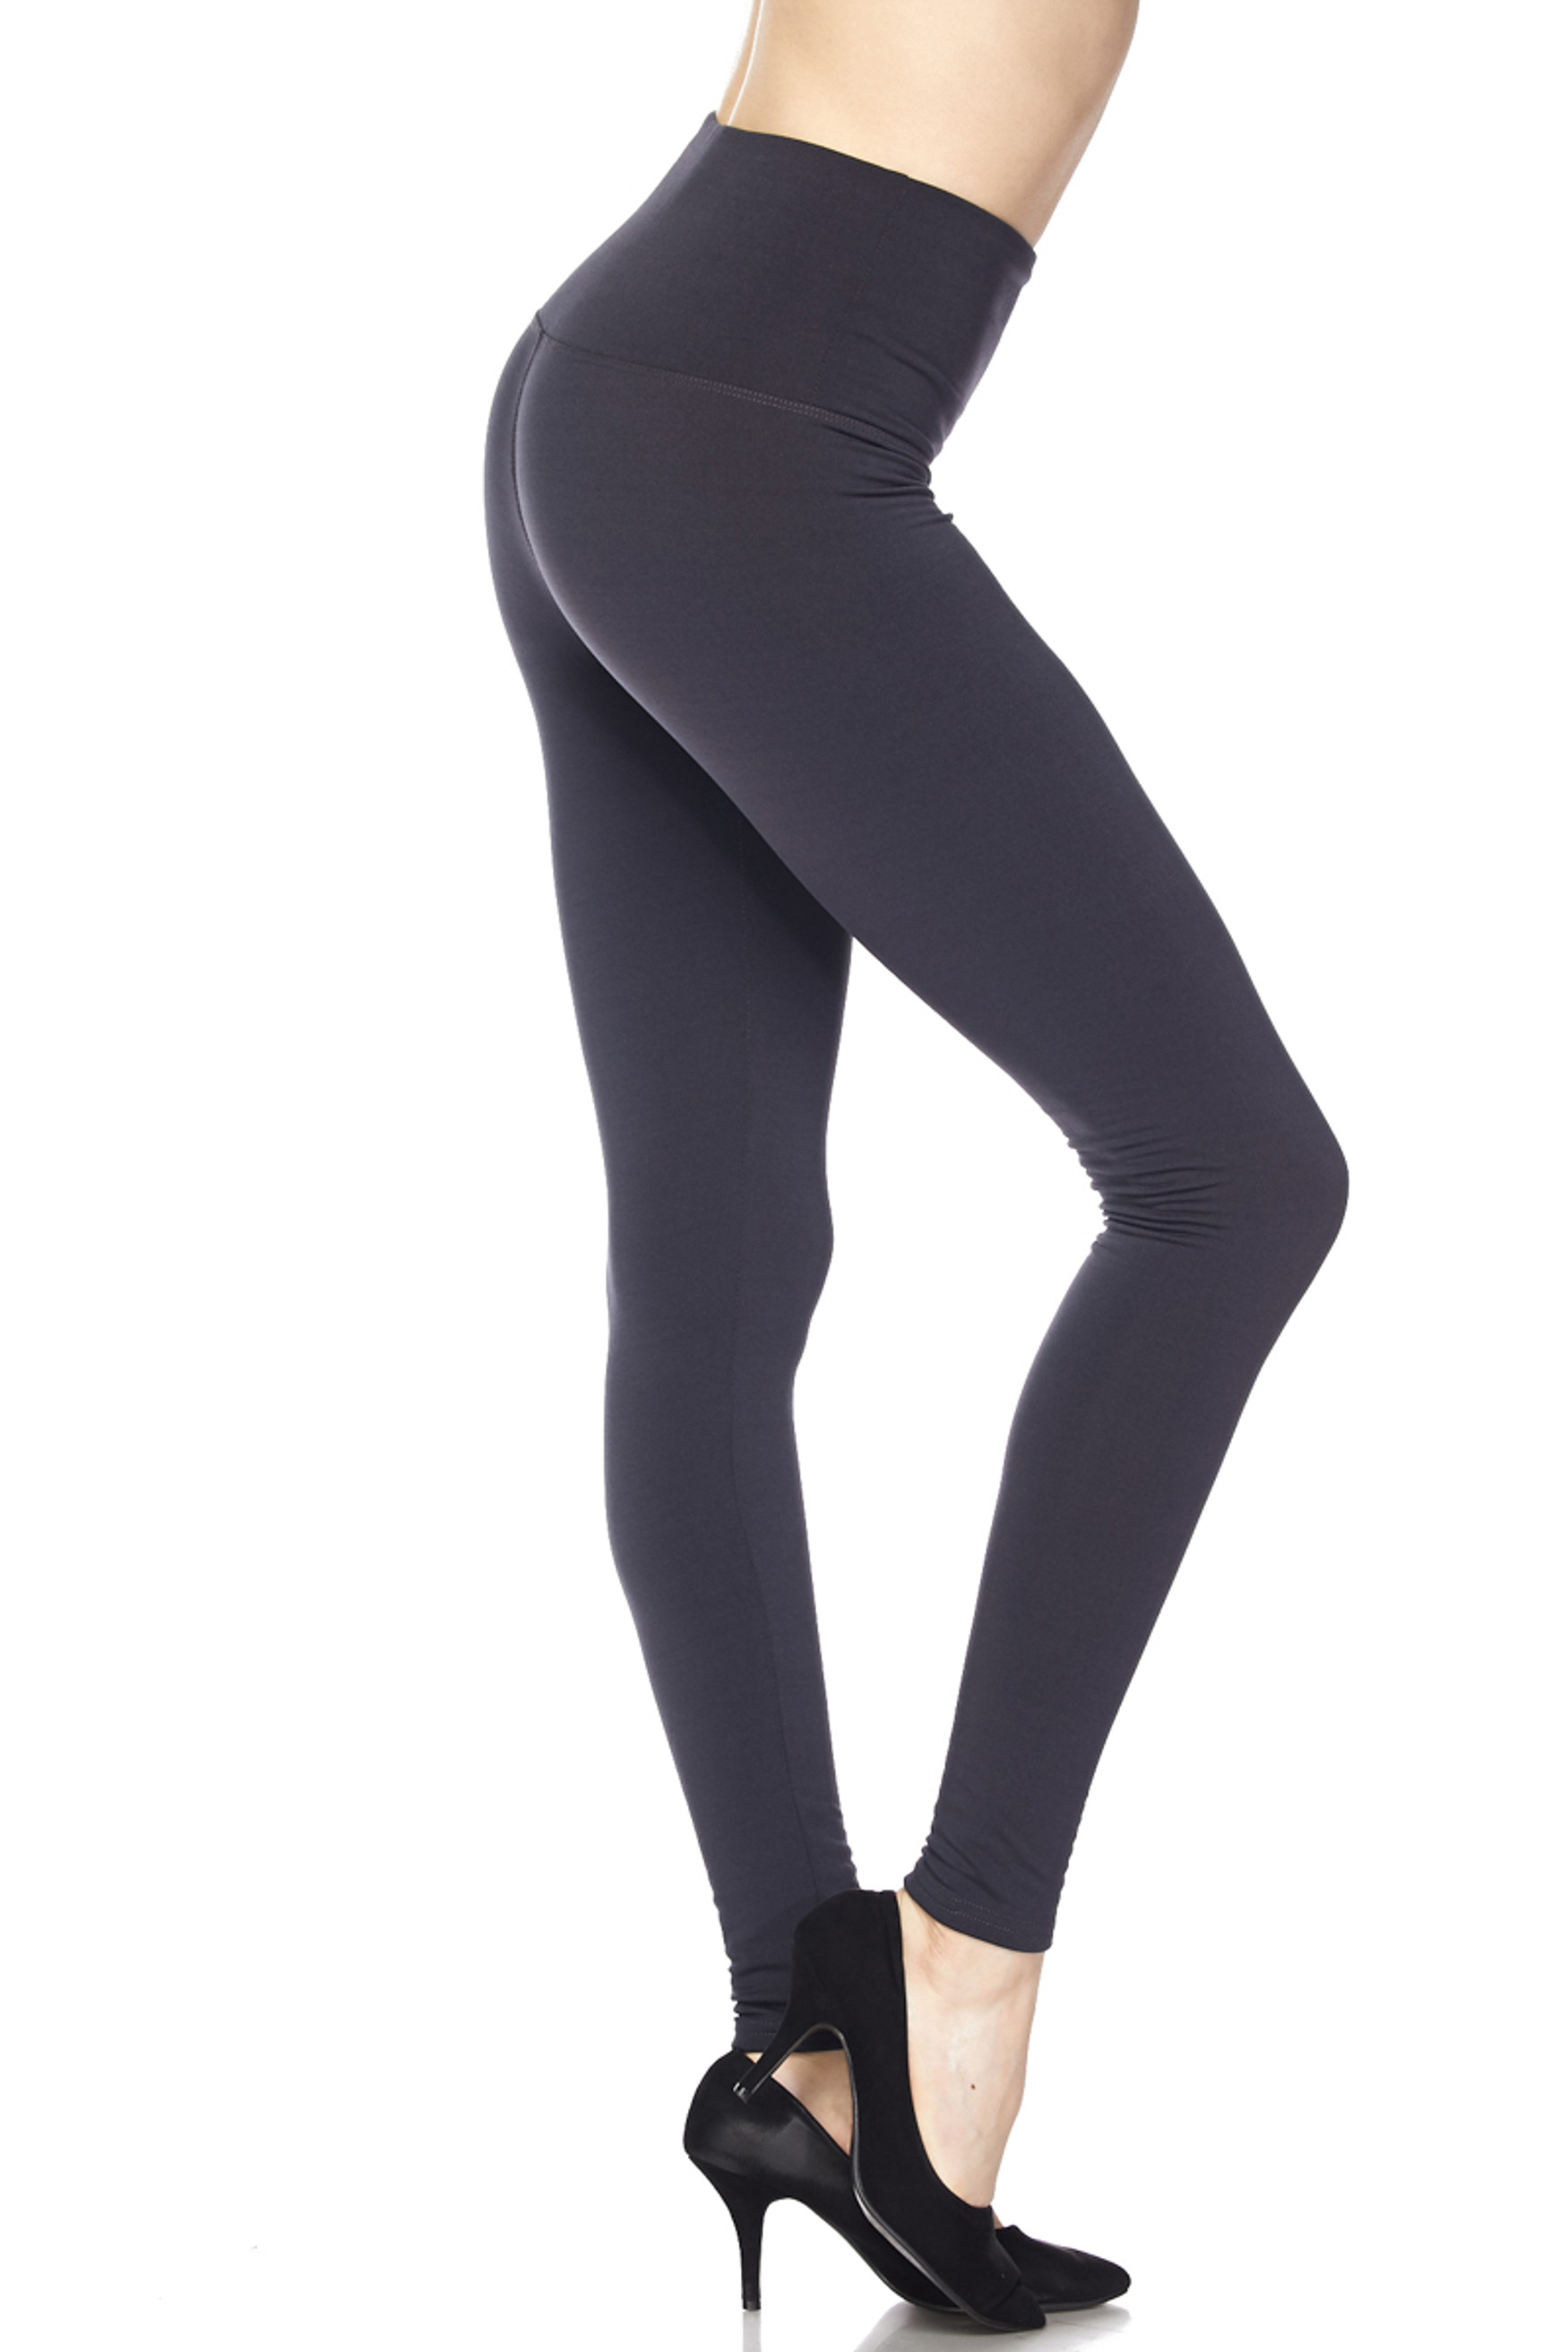 High Waisted Fleece Lined Leggings - 5 Inch Waistband